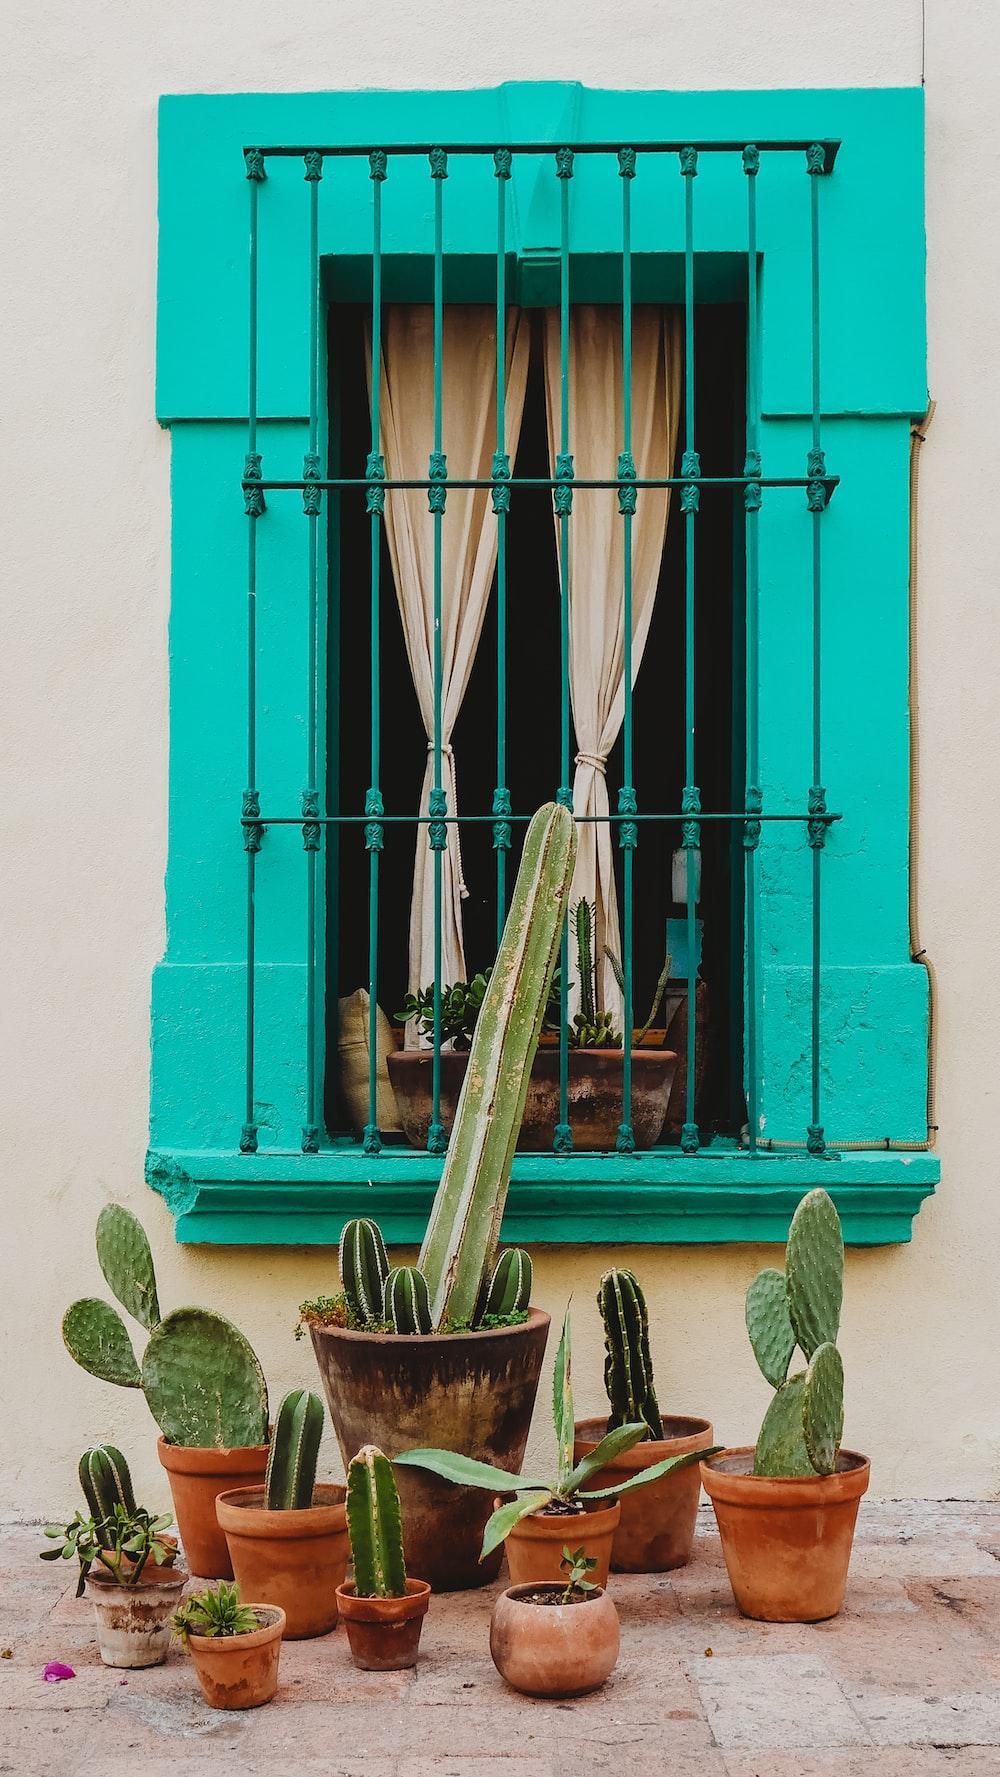 cactus near window